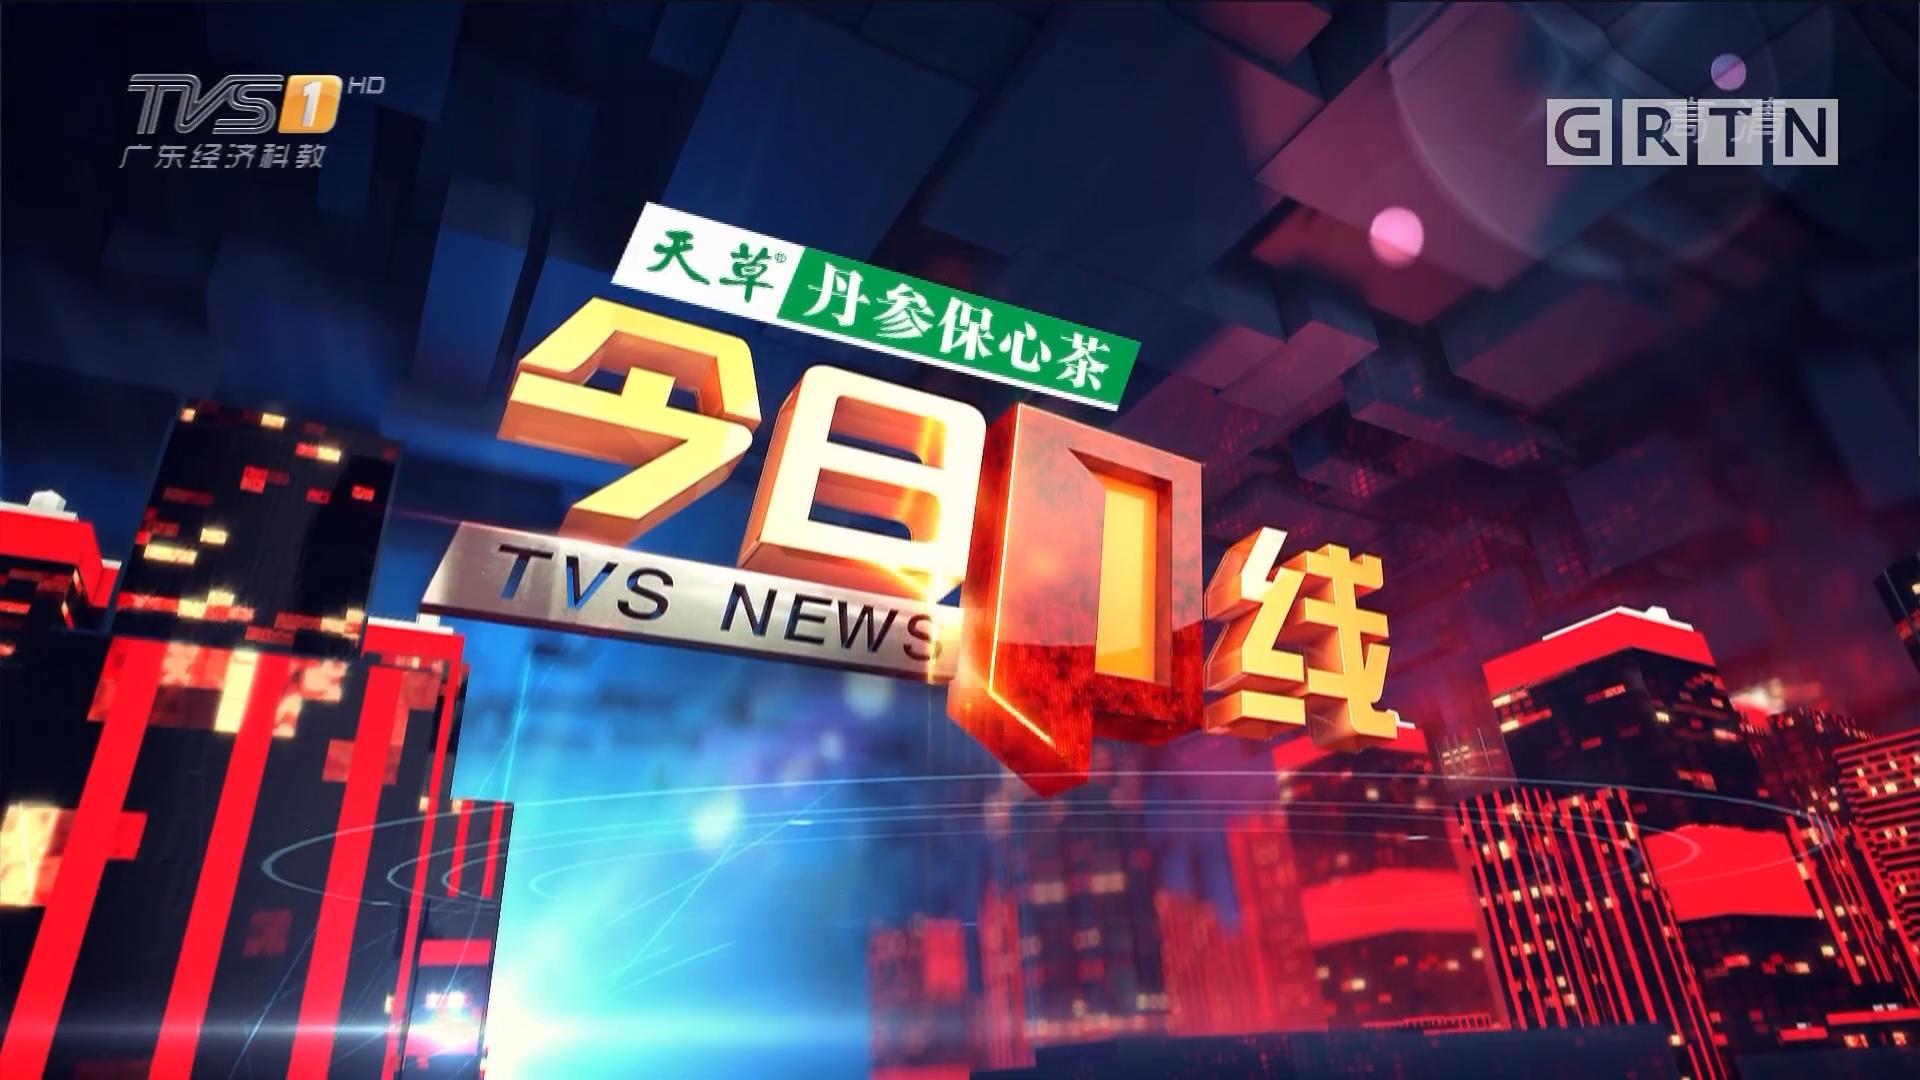 [HD][2017-09-30]今日一线:广东省暨广州市各界隆重举行公祭烈士活动